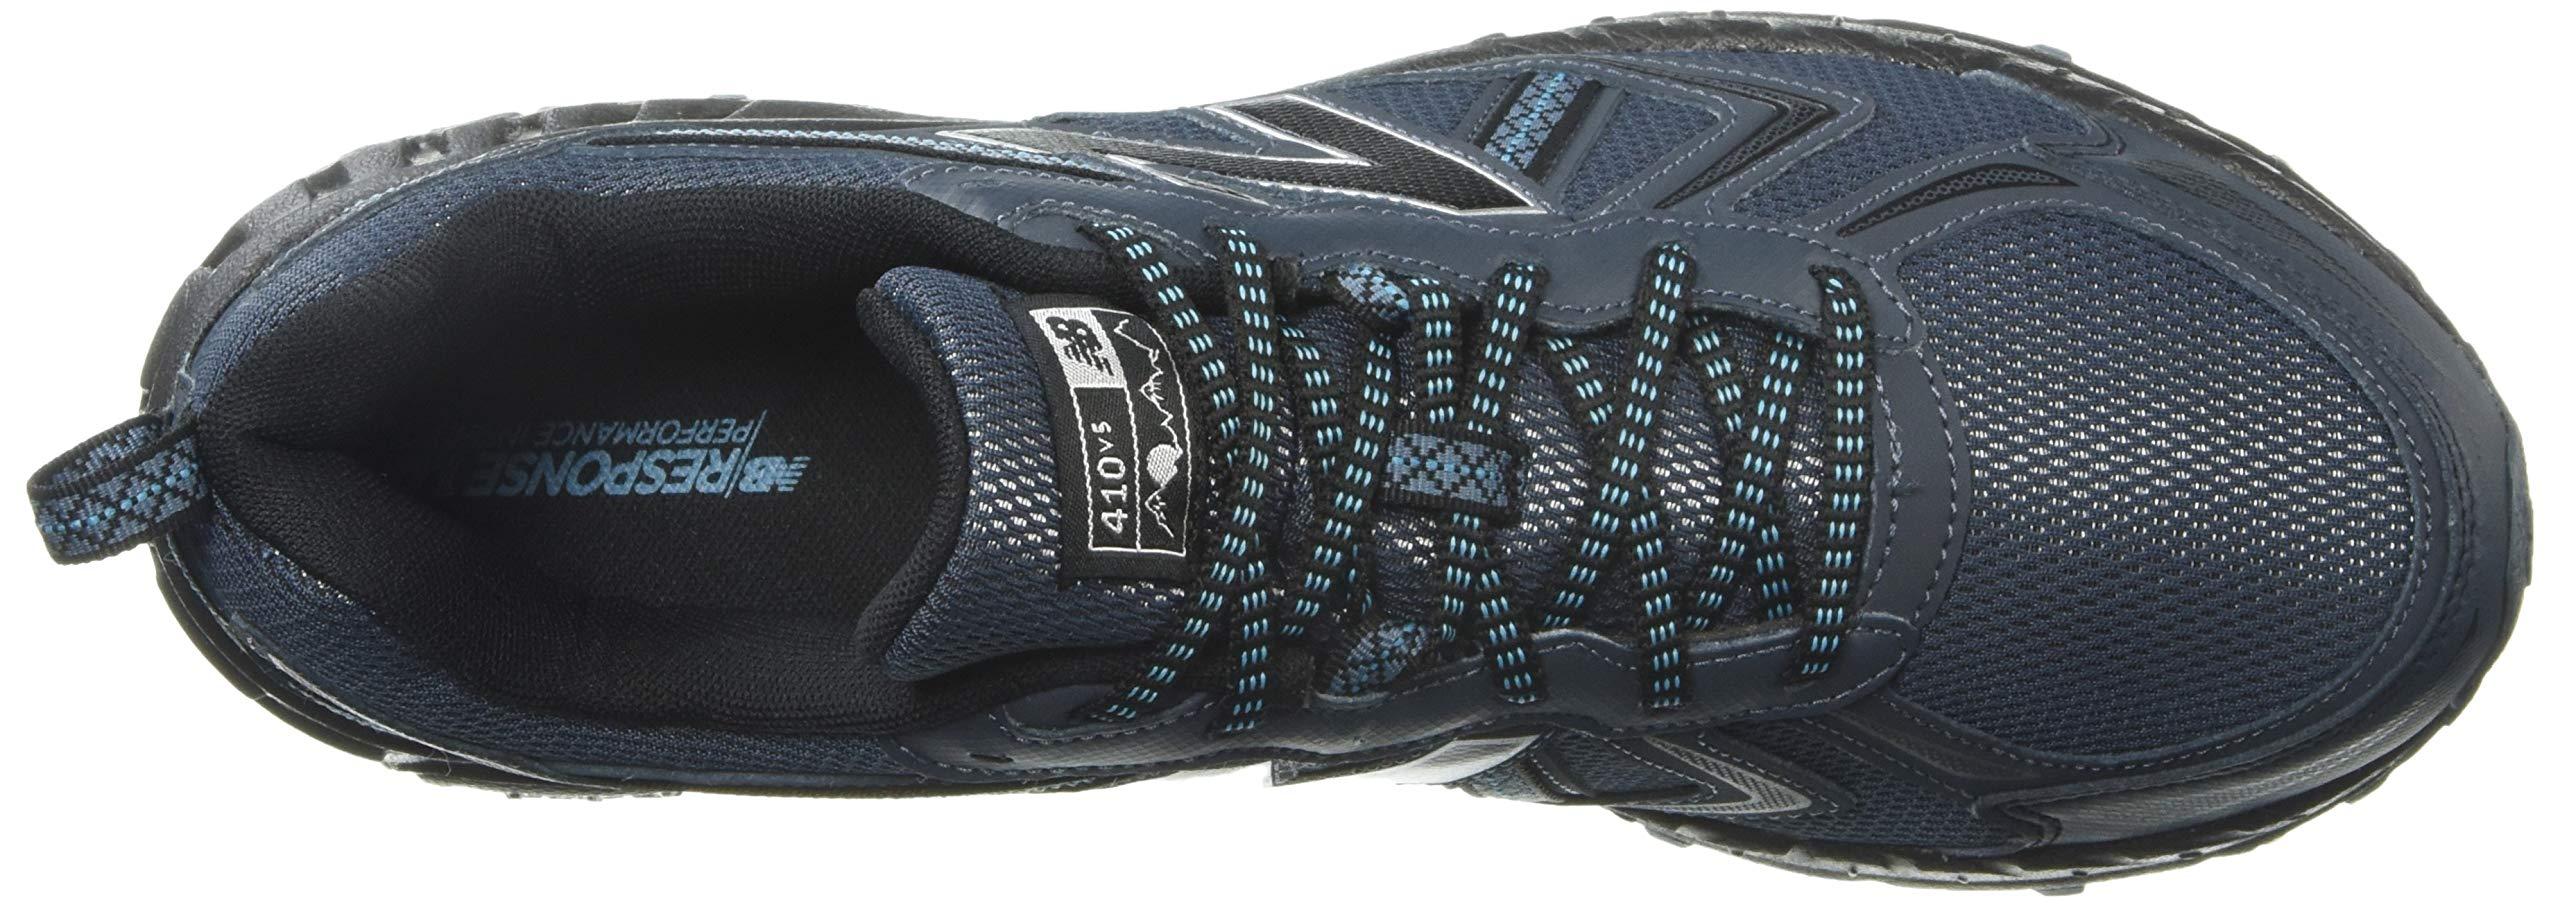 New Balance Men's 410v5 Cushioning Trail Running Shoe, Petrol/Cadet/Black, 7 D US by New Balance (Image #8)